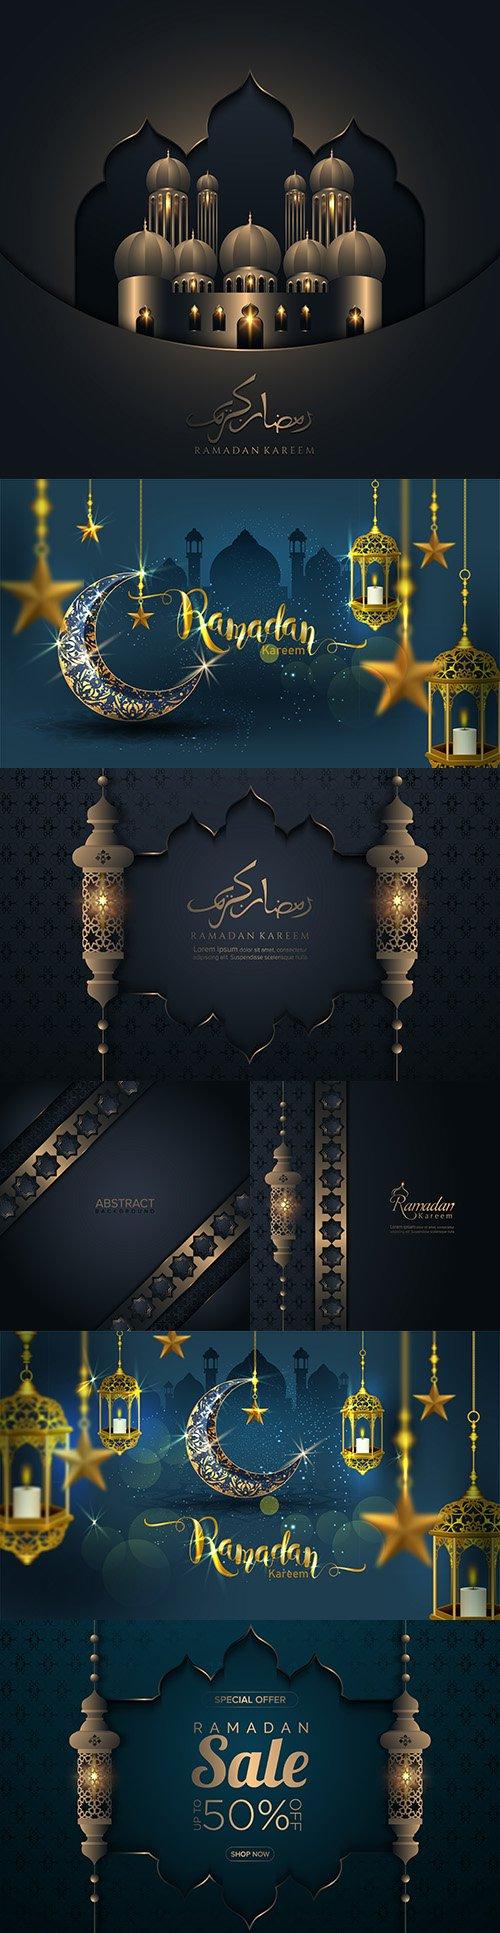 Ramadan Kareem banner golden lantern and mosque illustration